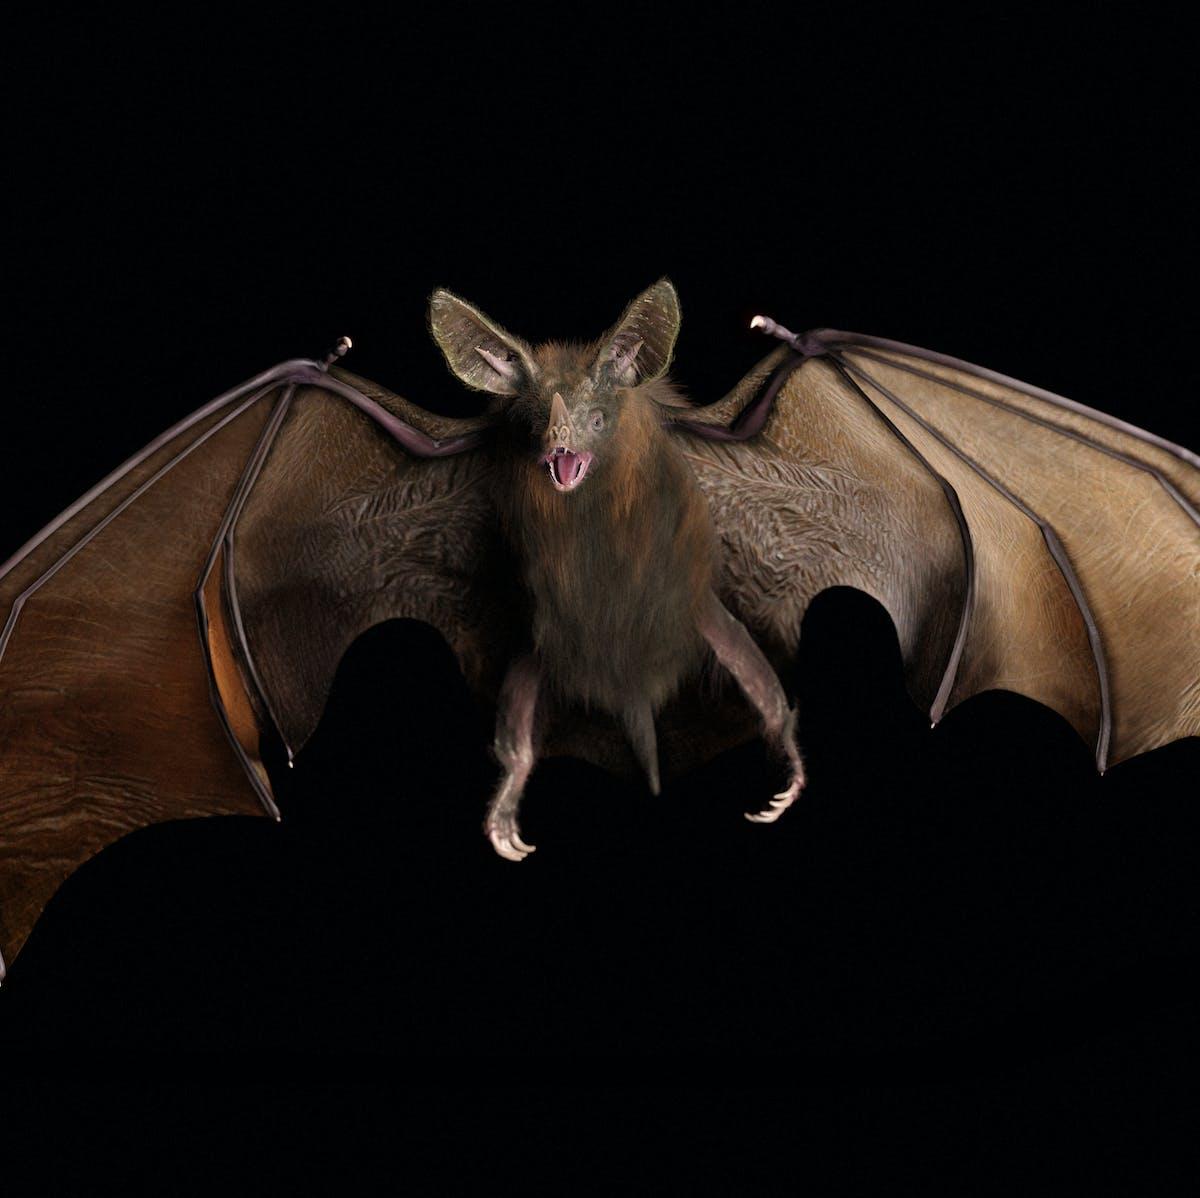 Meet friendly vampire bats: They drink blood, cuddle, and groom fellow bats